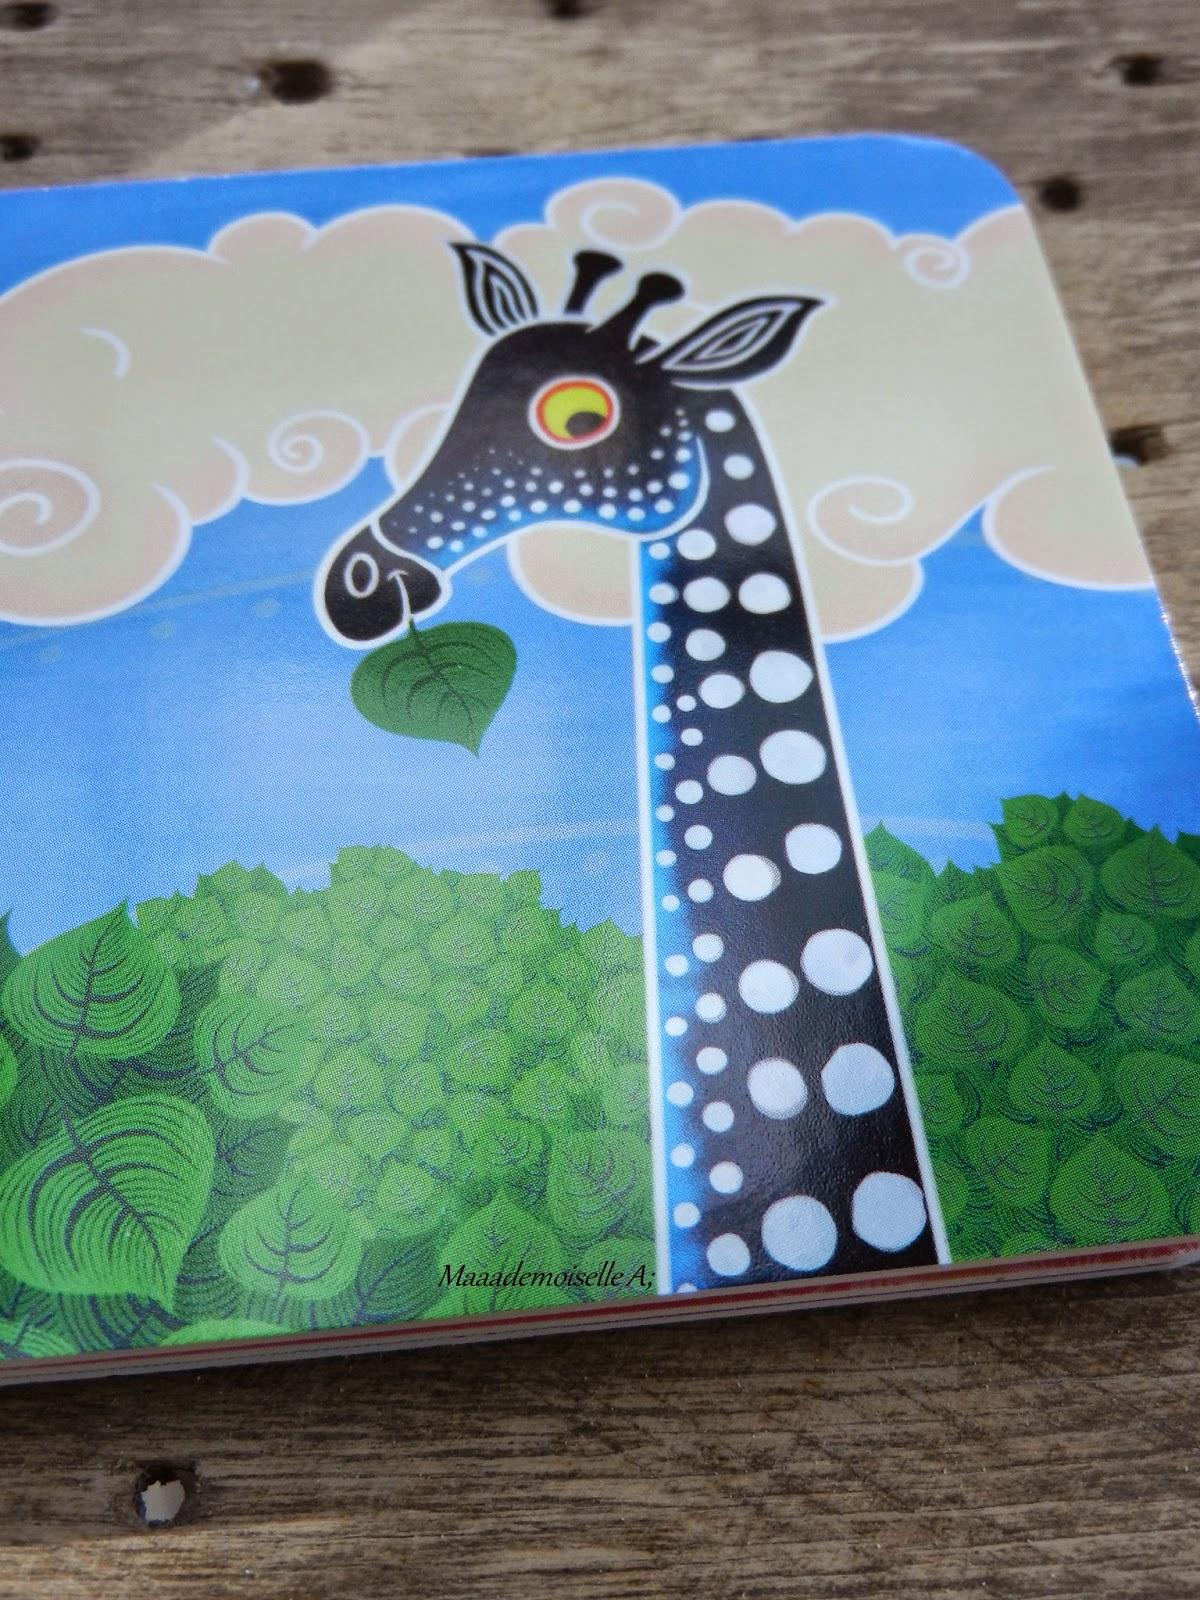 La petite bibliothèque de Tinga Tinga (Présentation & Avis)(Chut, les enfants lisent #5)